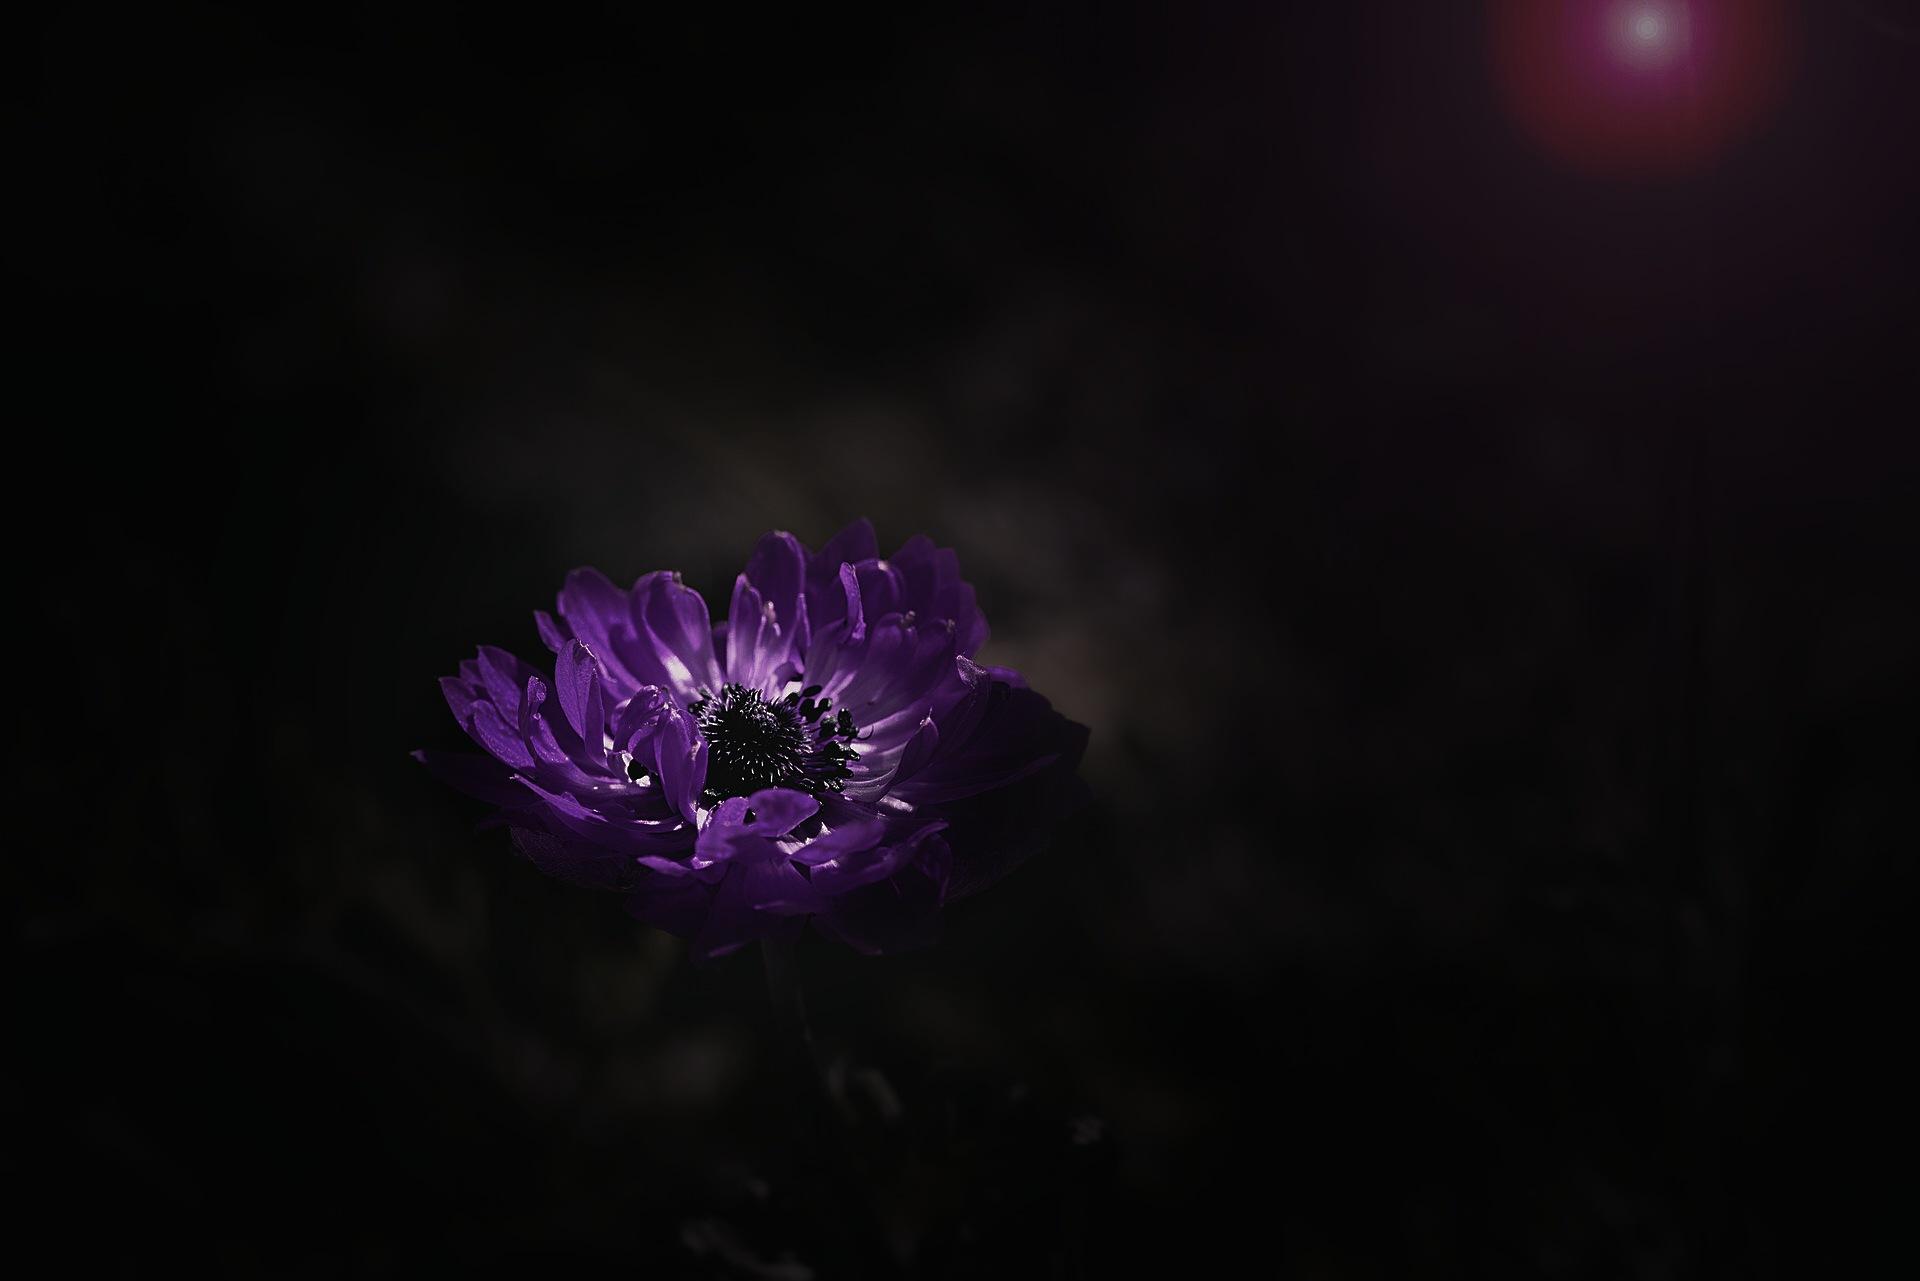 Anemone  by Lsb23